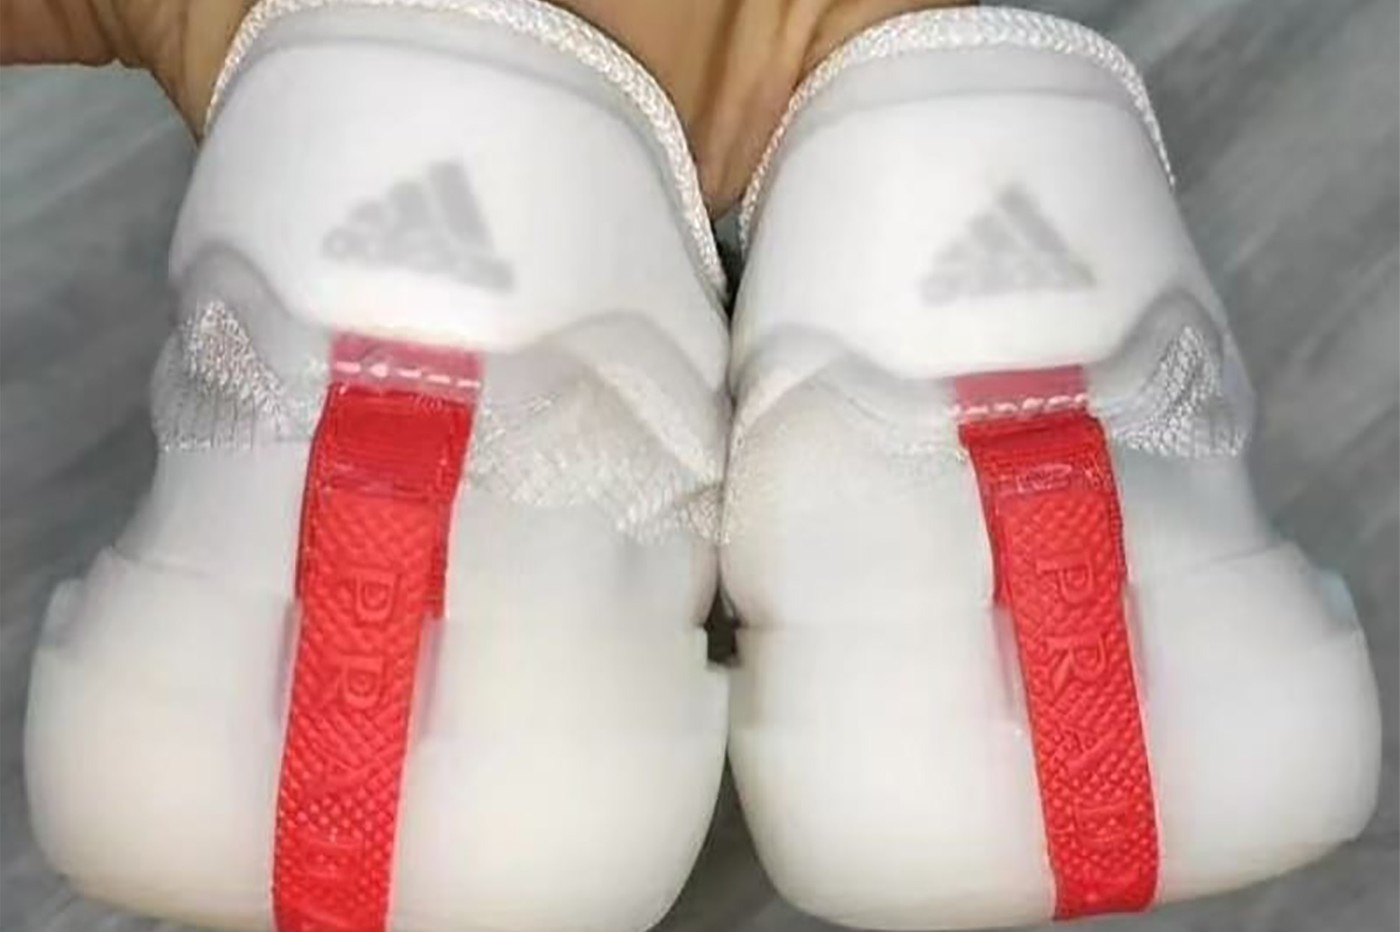 Prada x Adidas プラダ x アディダス back